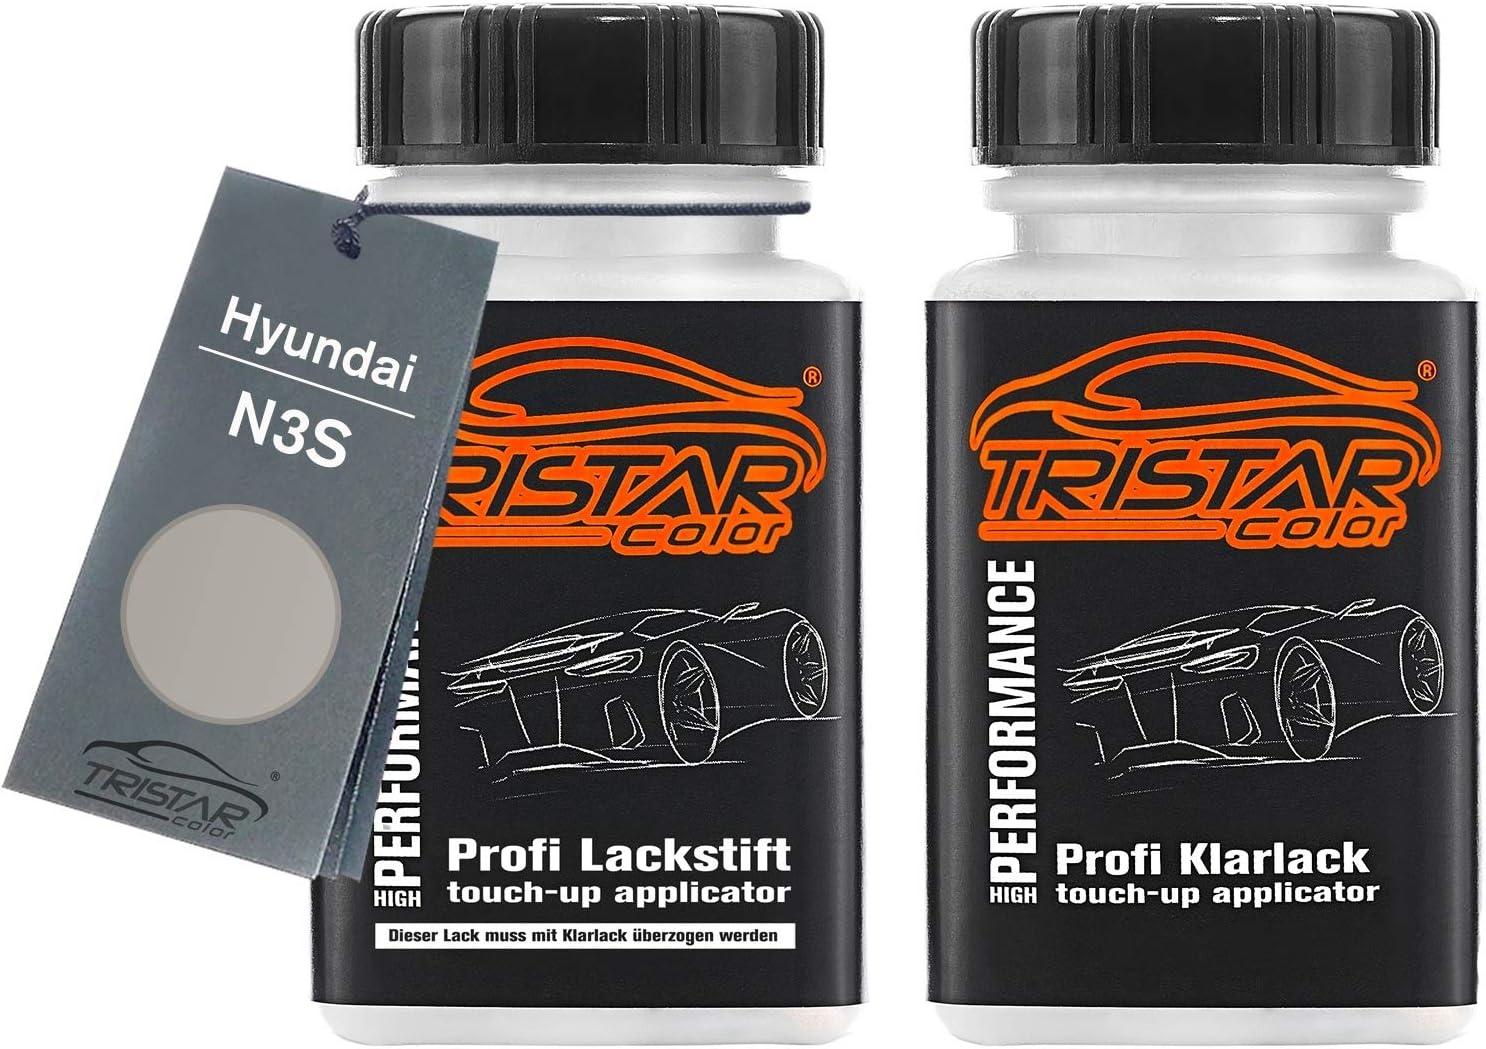 Tristarcolor Autolack Lackstift Set Für Hyundai N3s Shimmering Silver Metallic Sleek Silver Metallic Basislack Klarlack Je 50ml Auto